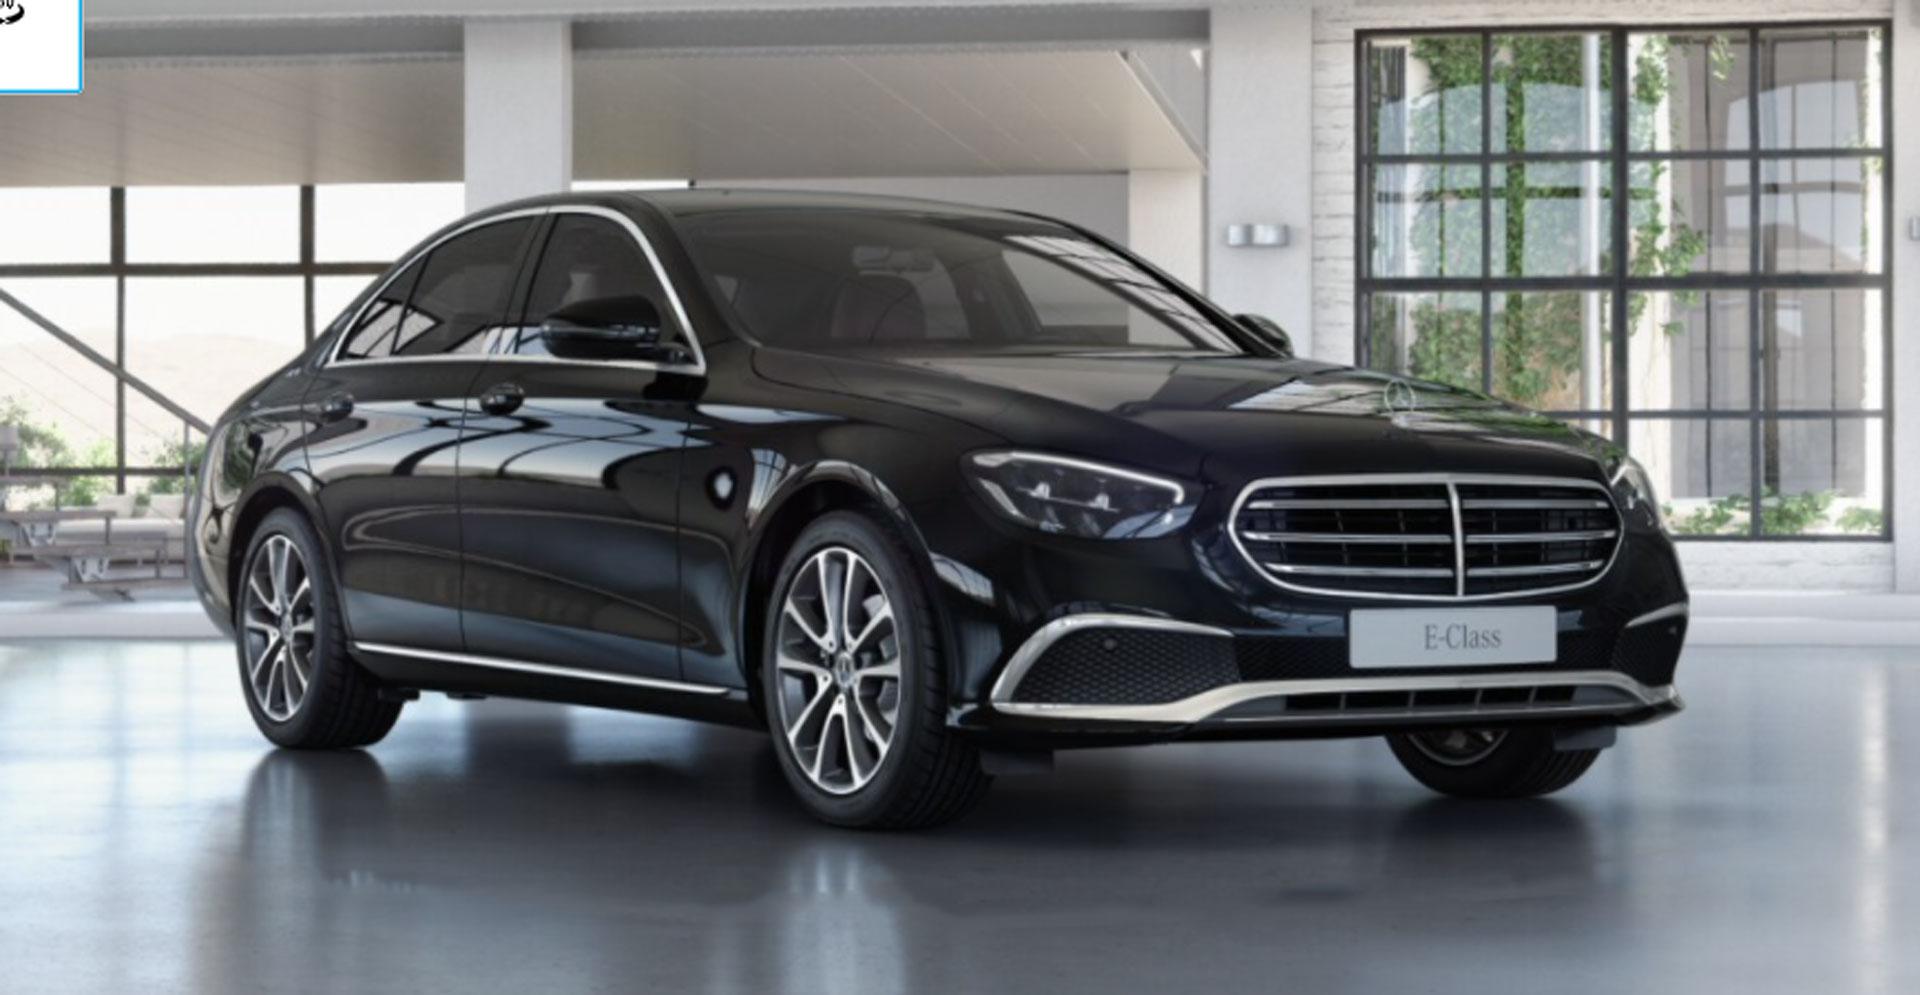 Mercedes-Benz E-Class Limousine 0152620165